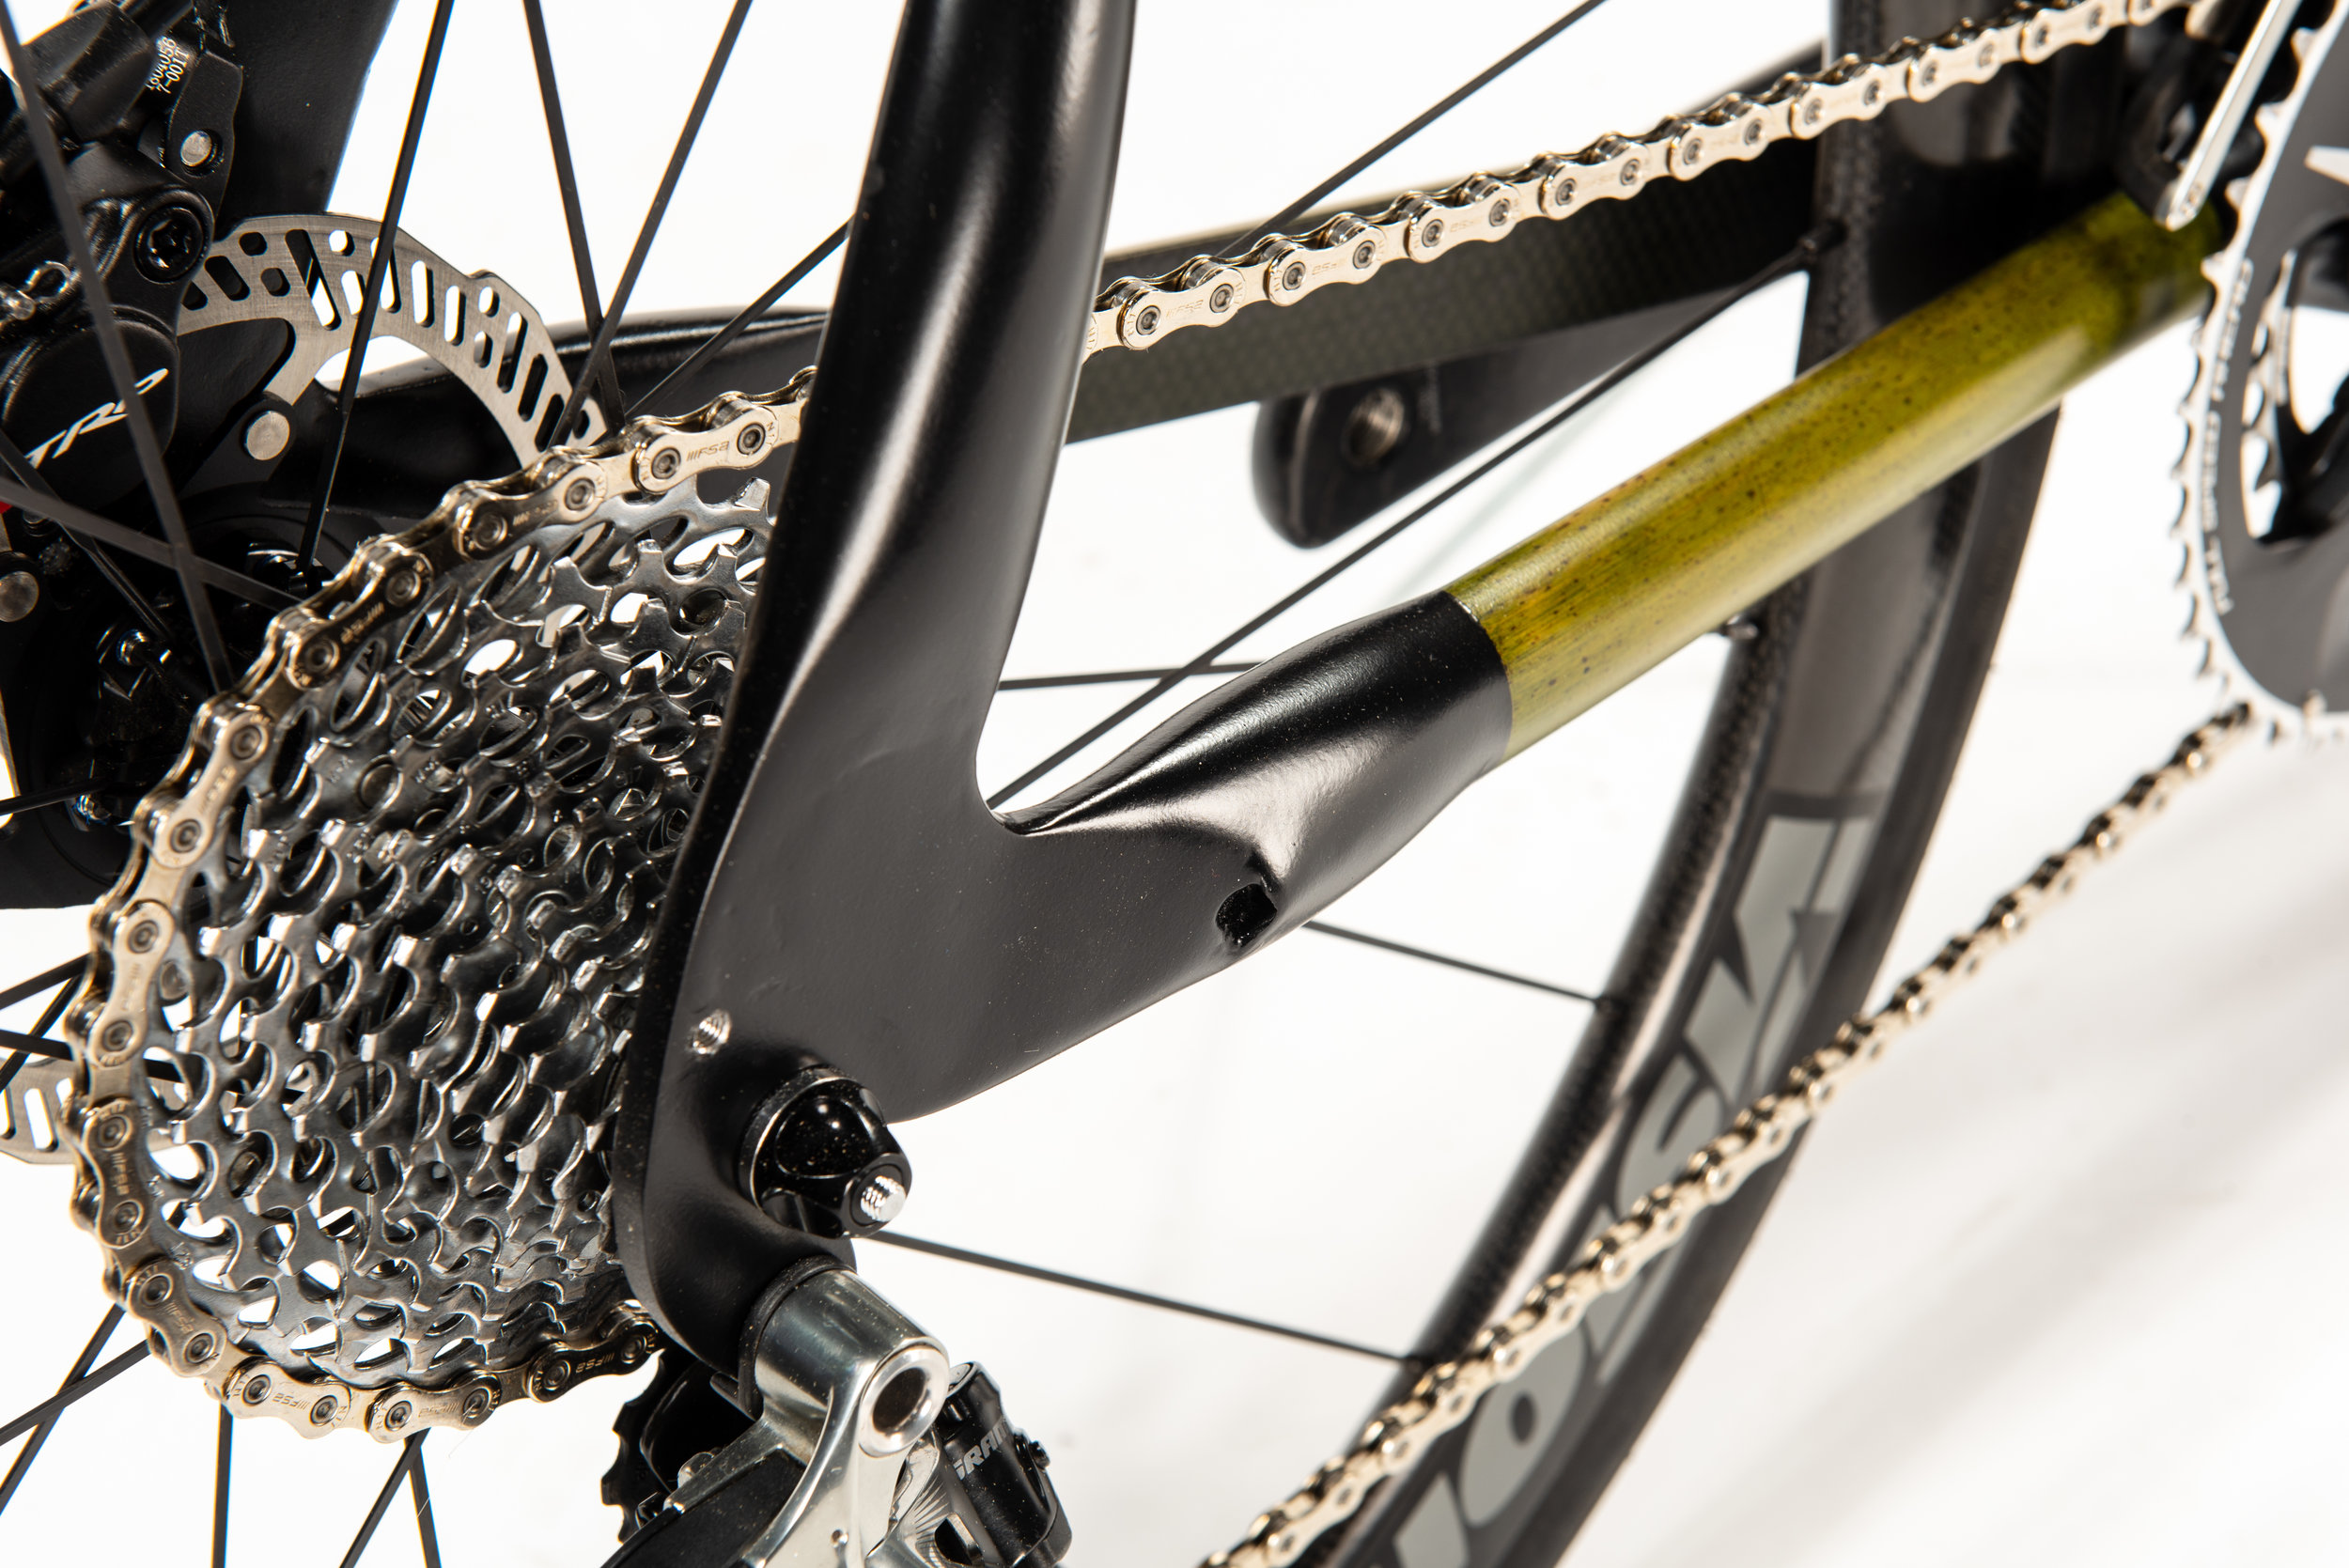 bamboo_bikes_hawaii_nahbs2019-bq-5.jpg